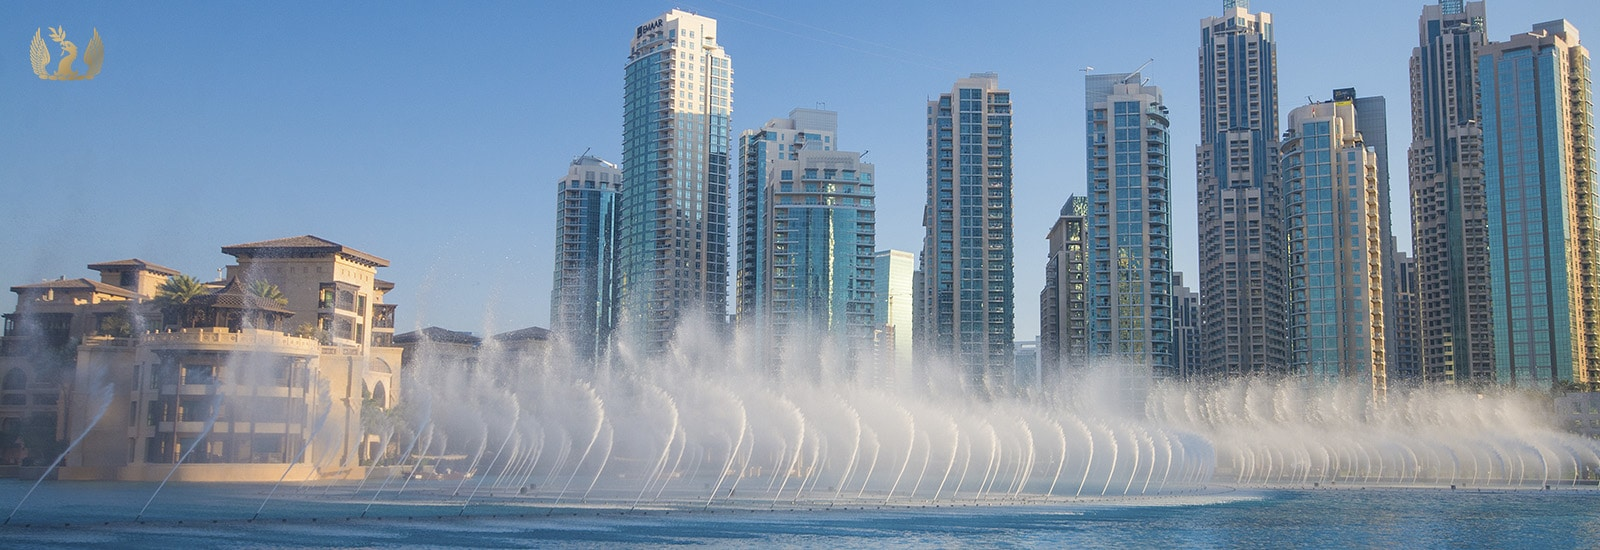 Dubai Fountain at Downtown Dubai